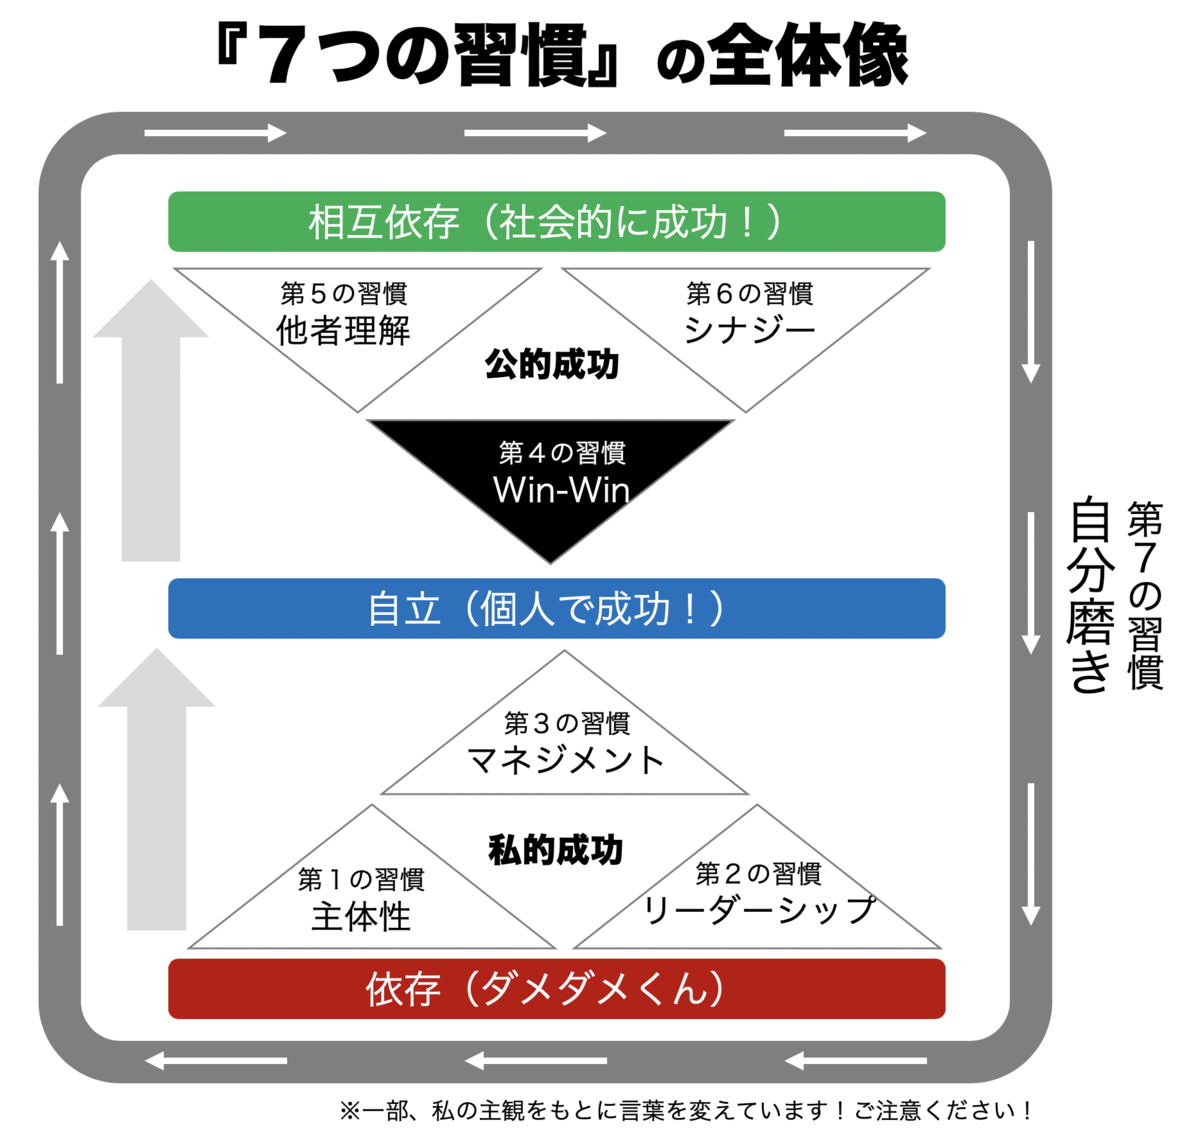 f:id:presen-sen-nin:20200708111601p:plain